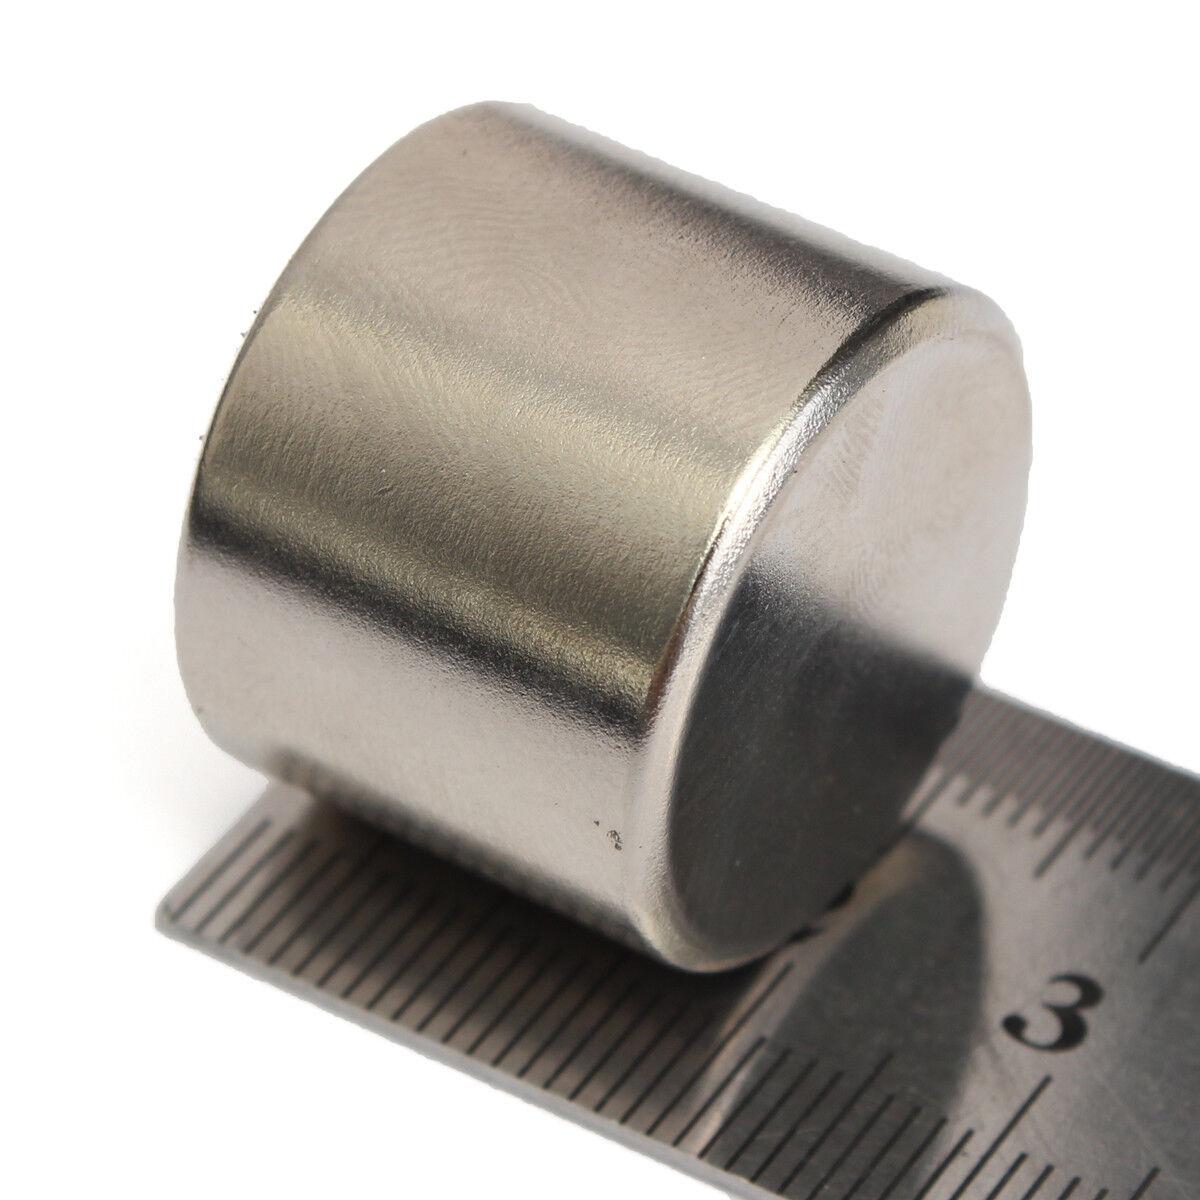 1x Super Strong Round Cylinder Fridge Magnet 25x20mm Rare Earth Neodymium N52